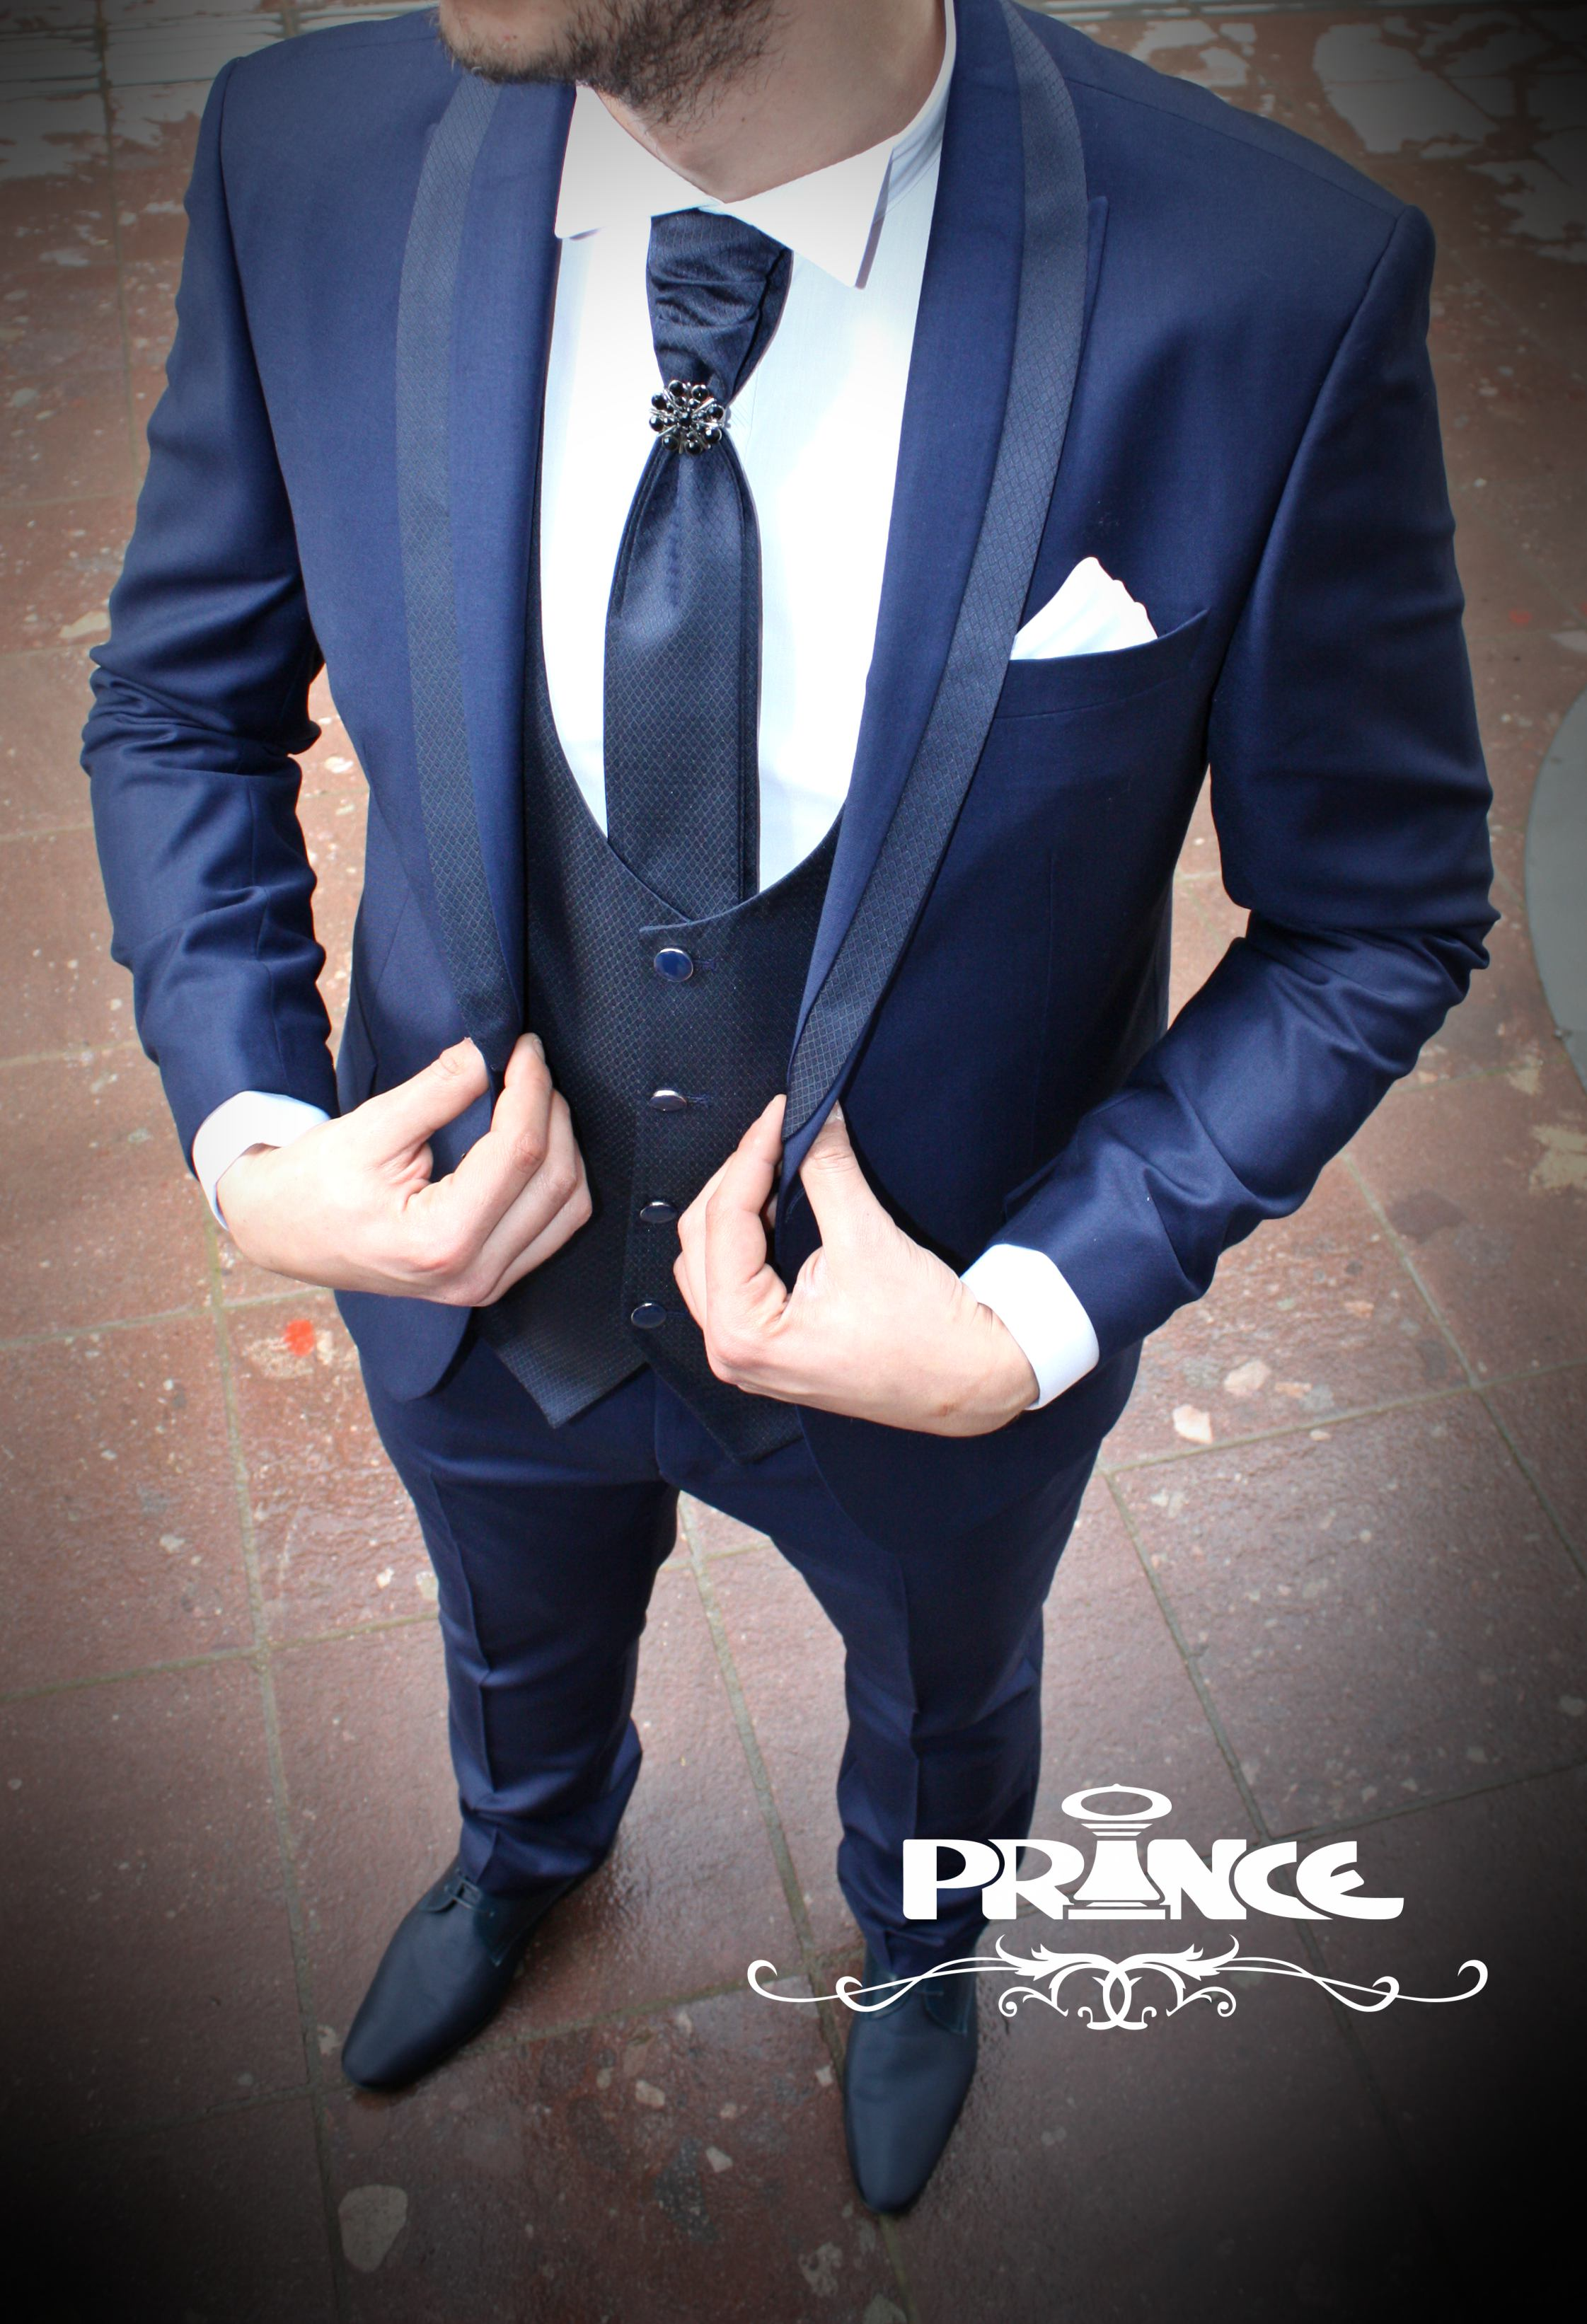 15ed68da9a79 450 Σετ Γαμπριάτικο Κοστούμι PRINCE